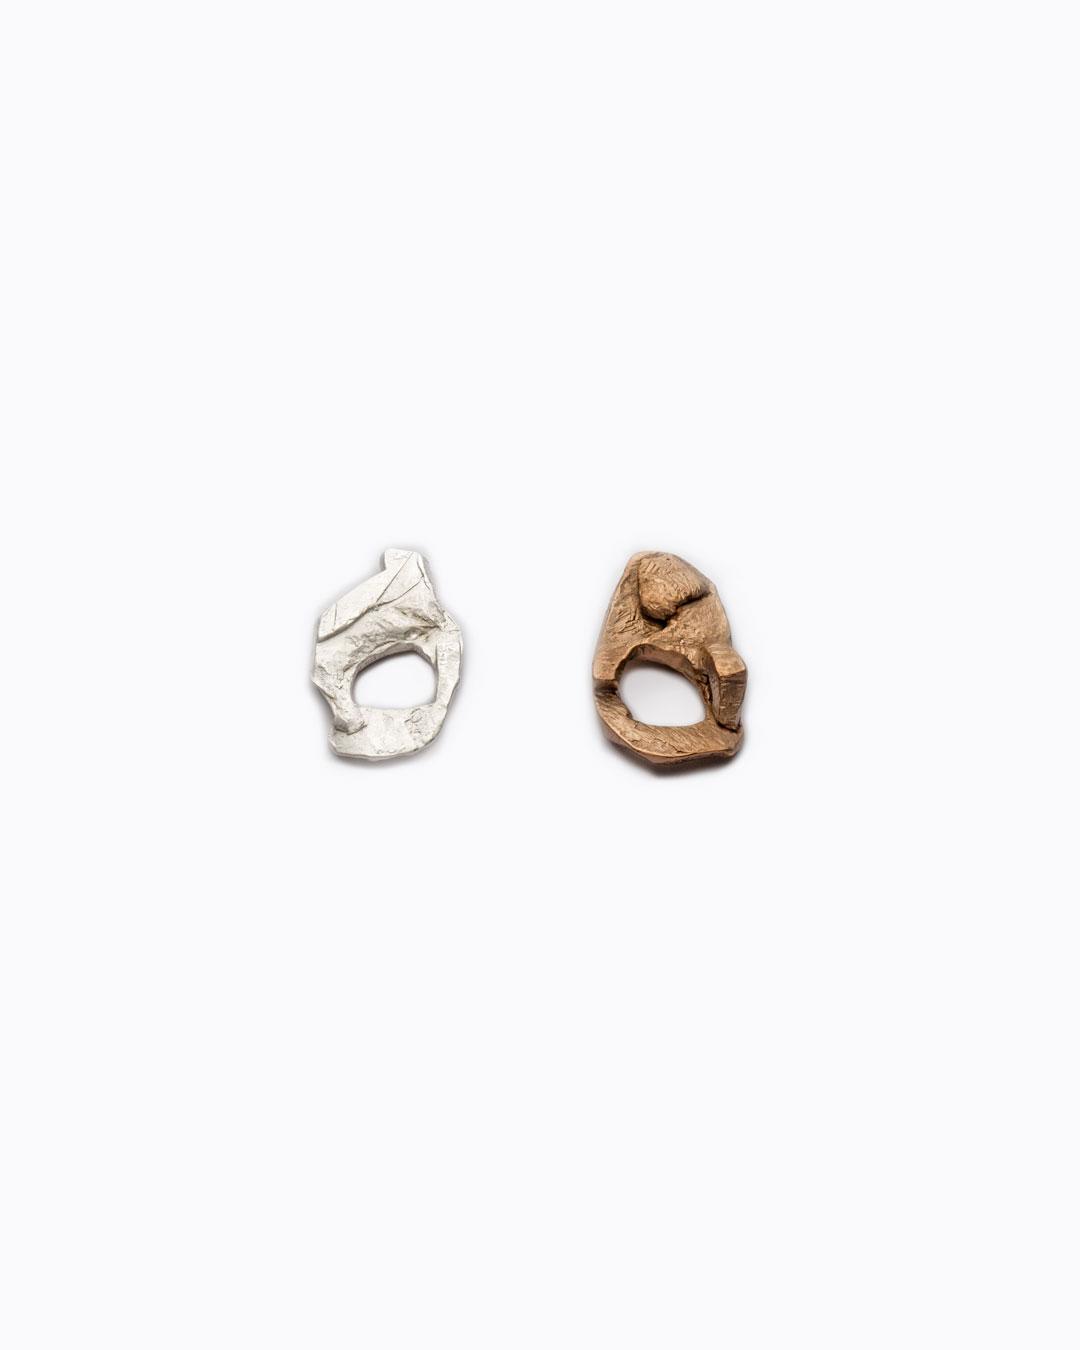 Iris Bodemer, untitled, 2012, ring; silver, 30 x 55 x 5 mm (left), €750